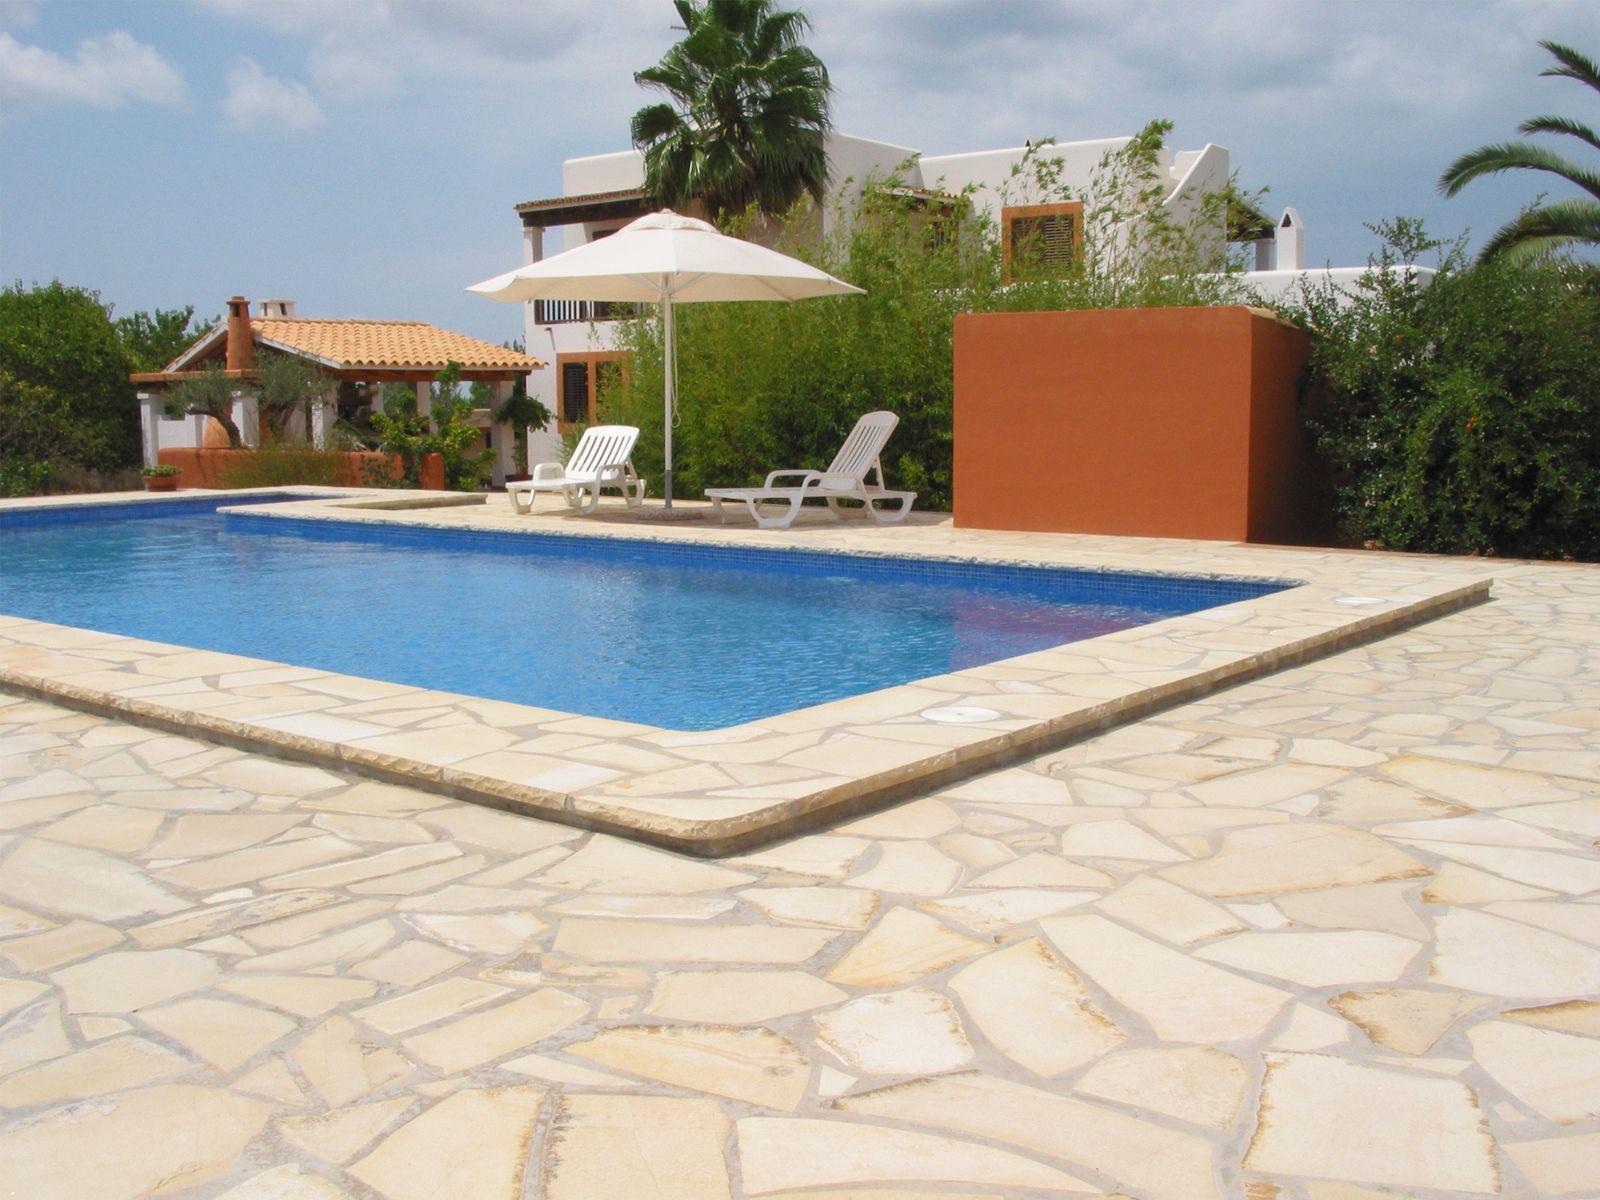 piedra natural solnhofen caliza para pavimento de piscina con de piscina de piedra irregular